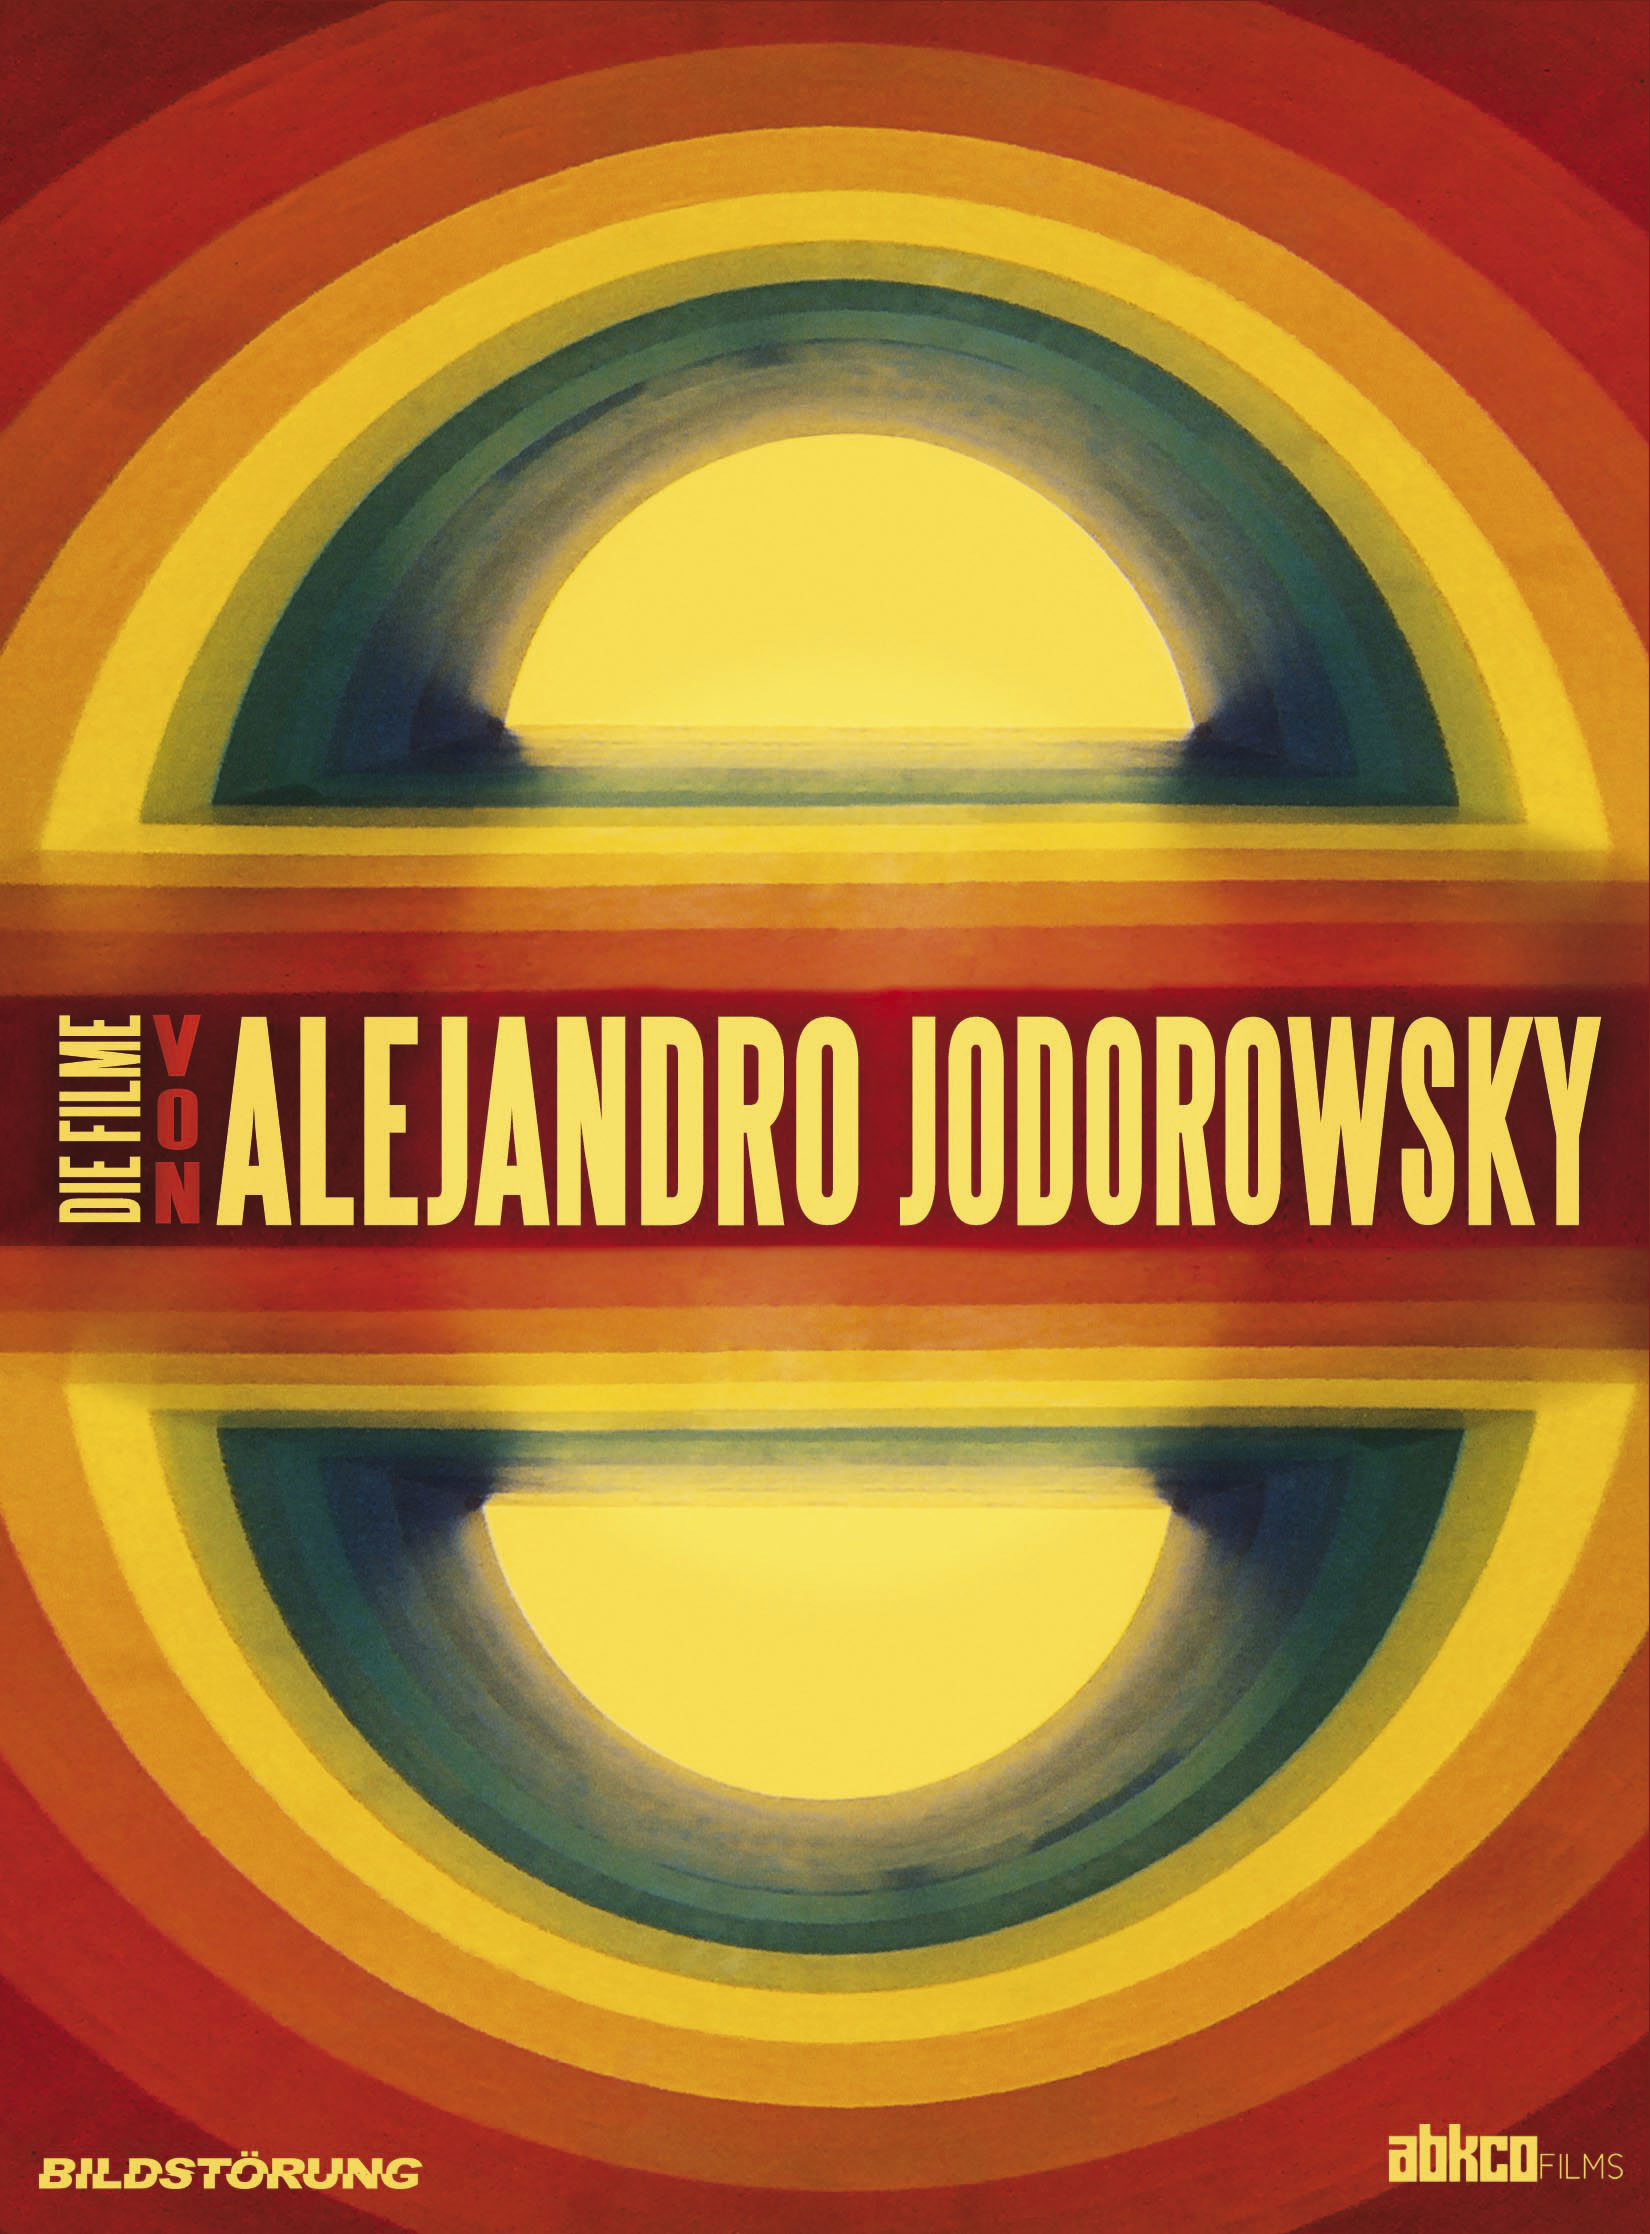 JODOROWSKY BOX Cover